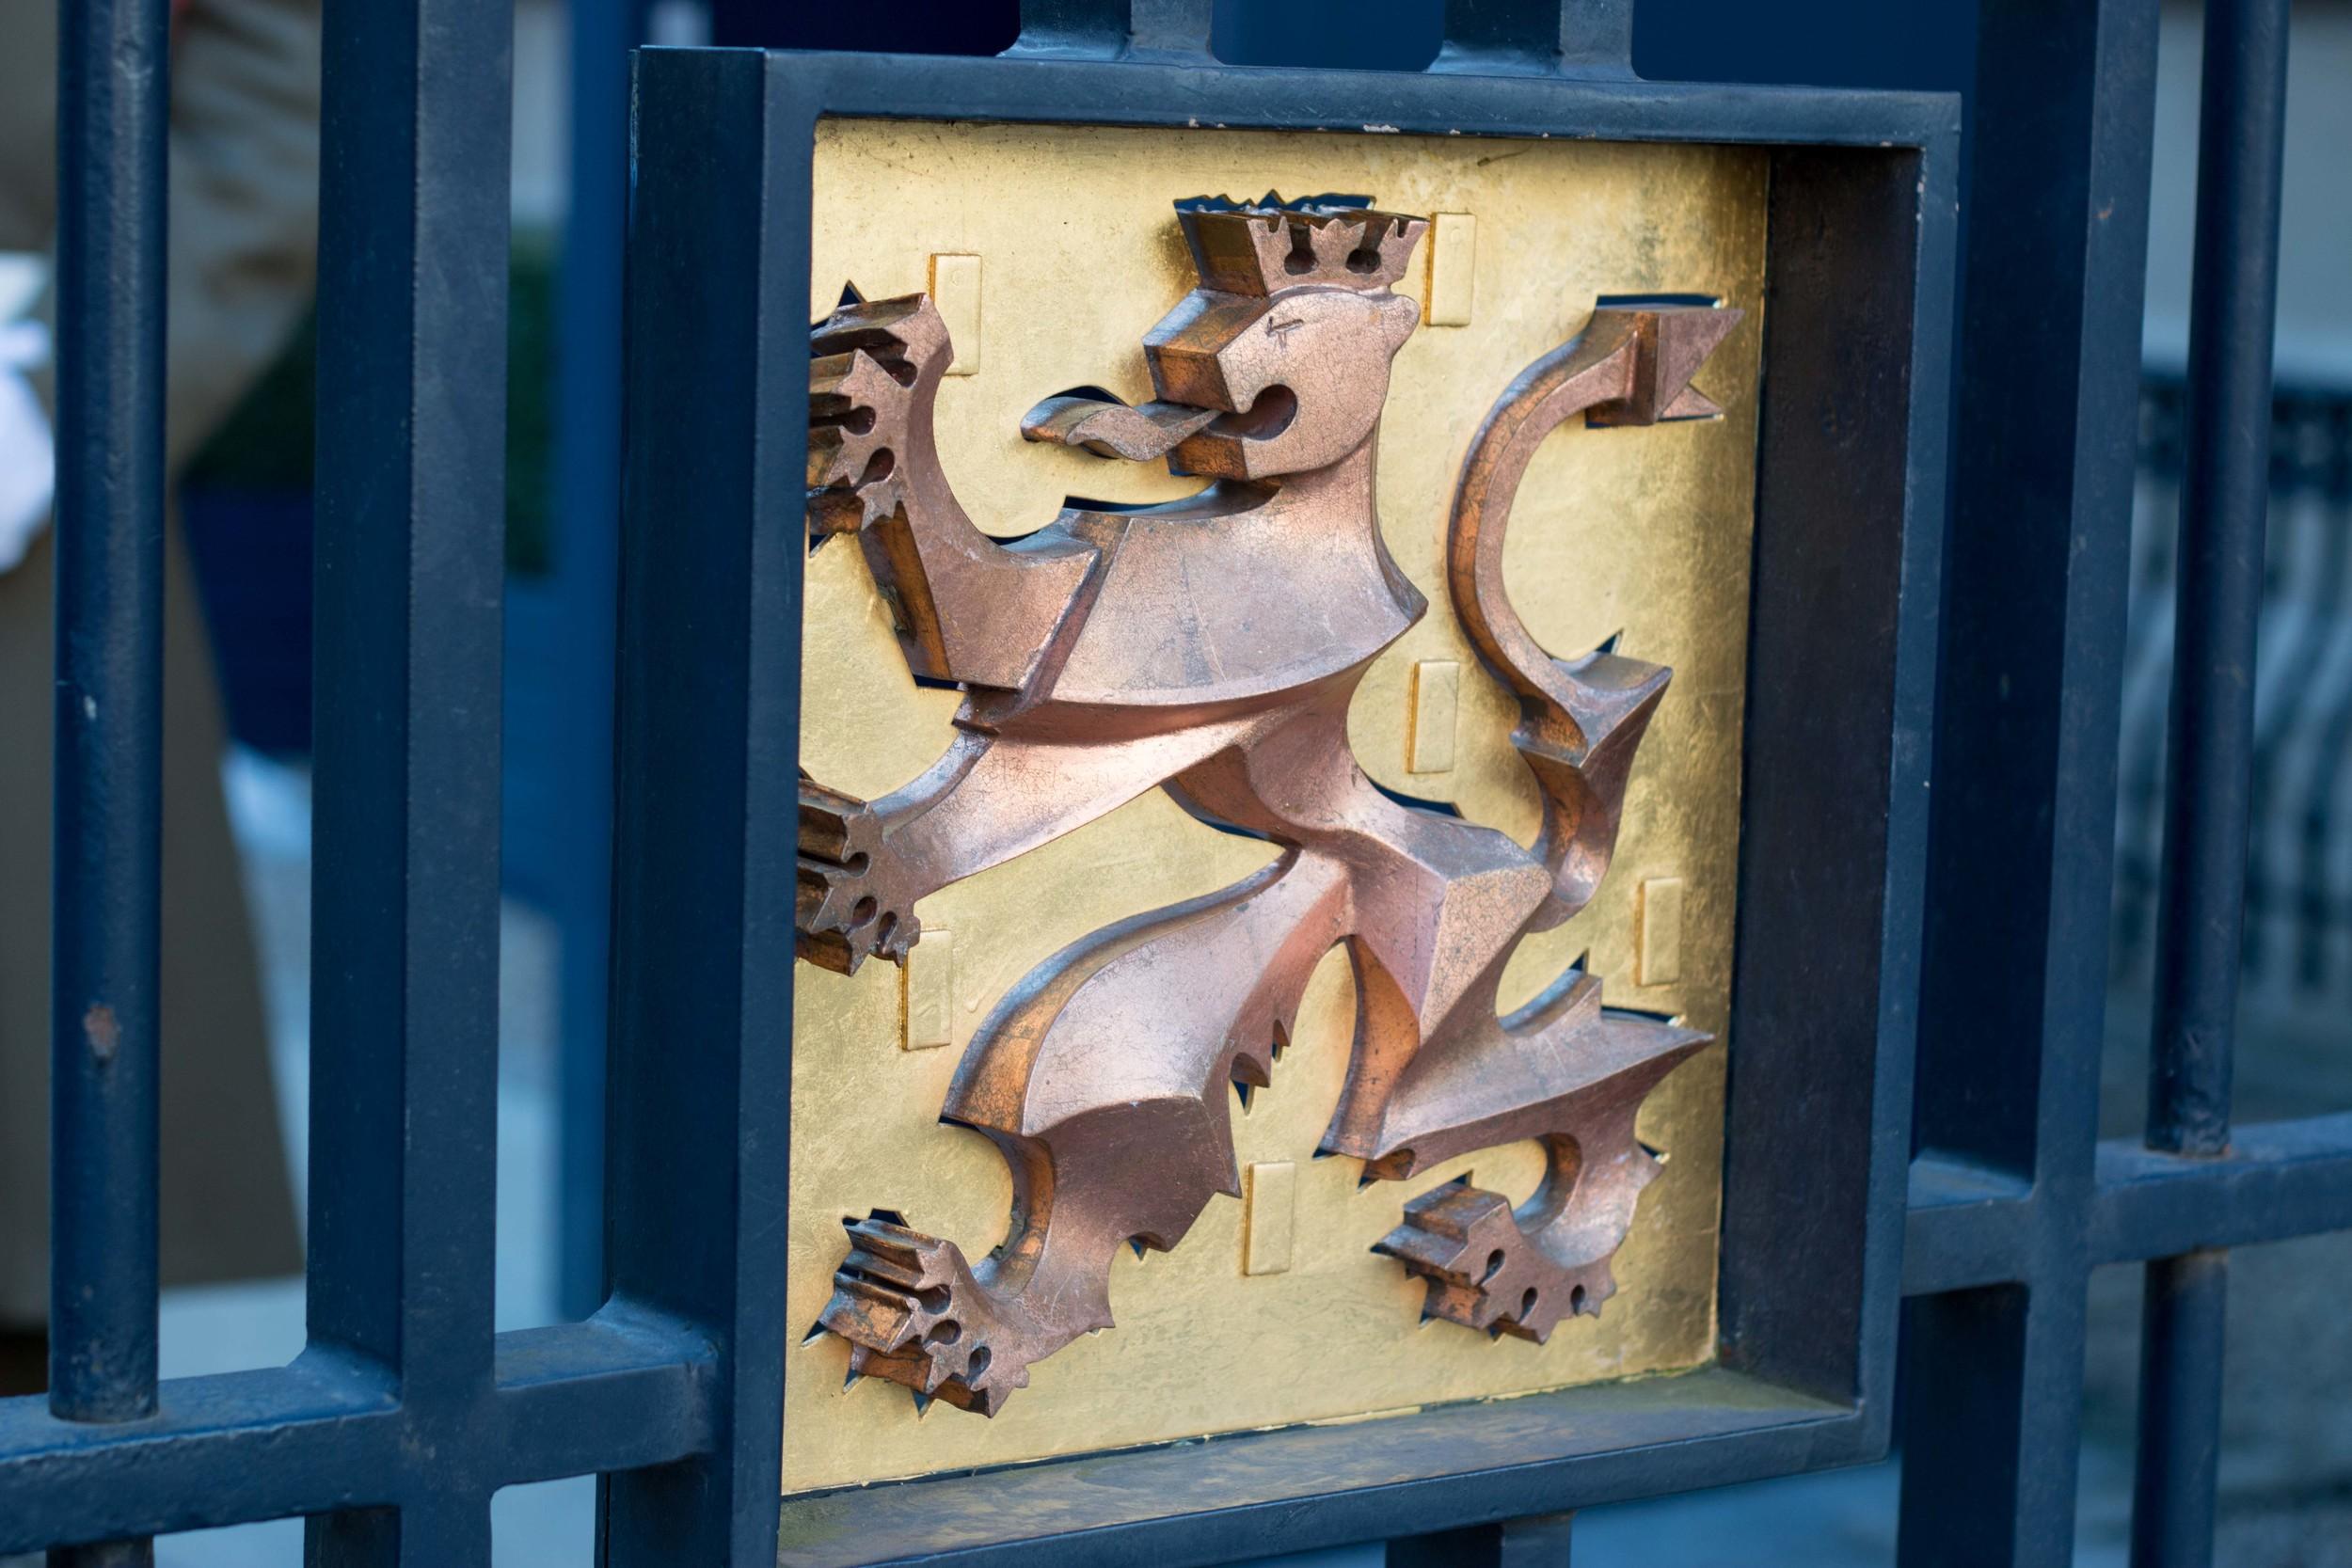 Grand Duchy Lion on the metal gates